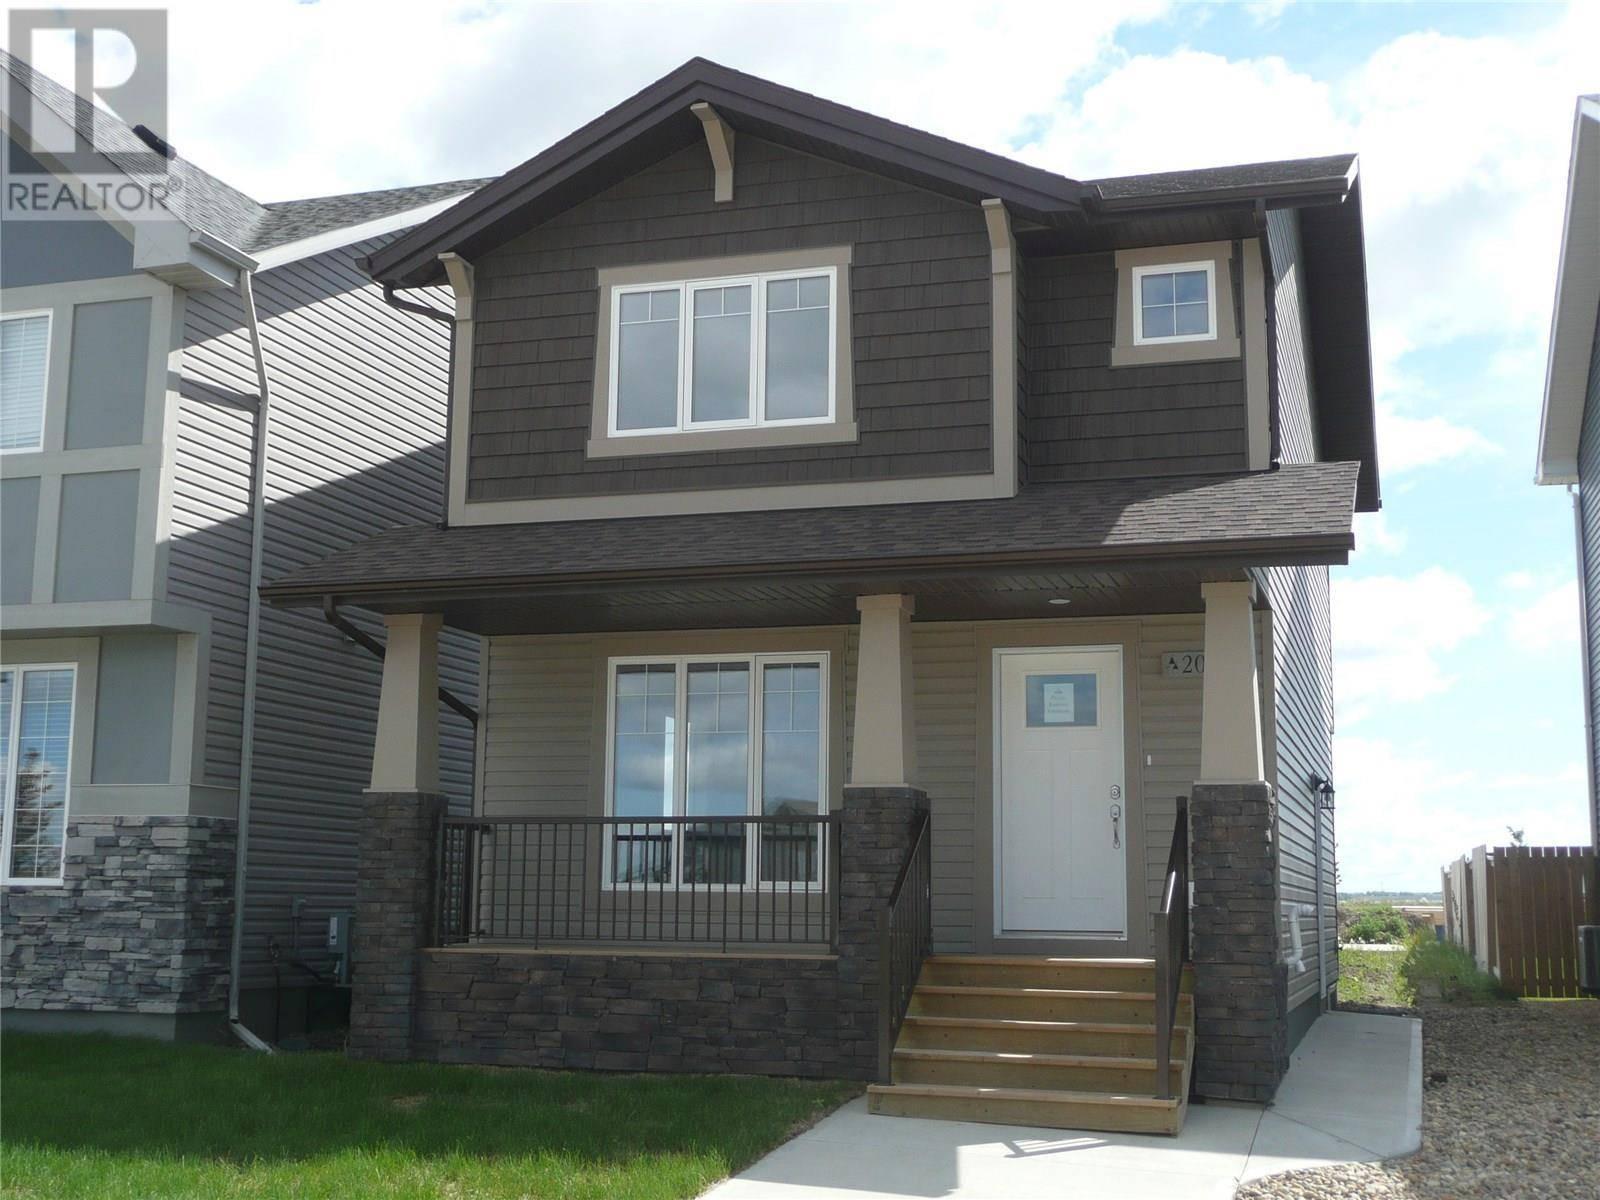 House for sale at 207 Secord Wy Saskatoon Saskatchewan - MLS: SK778290